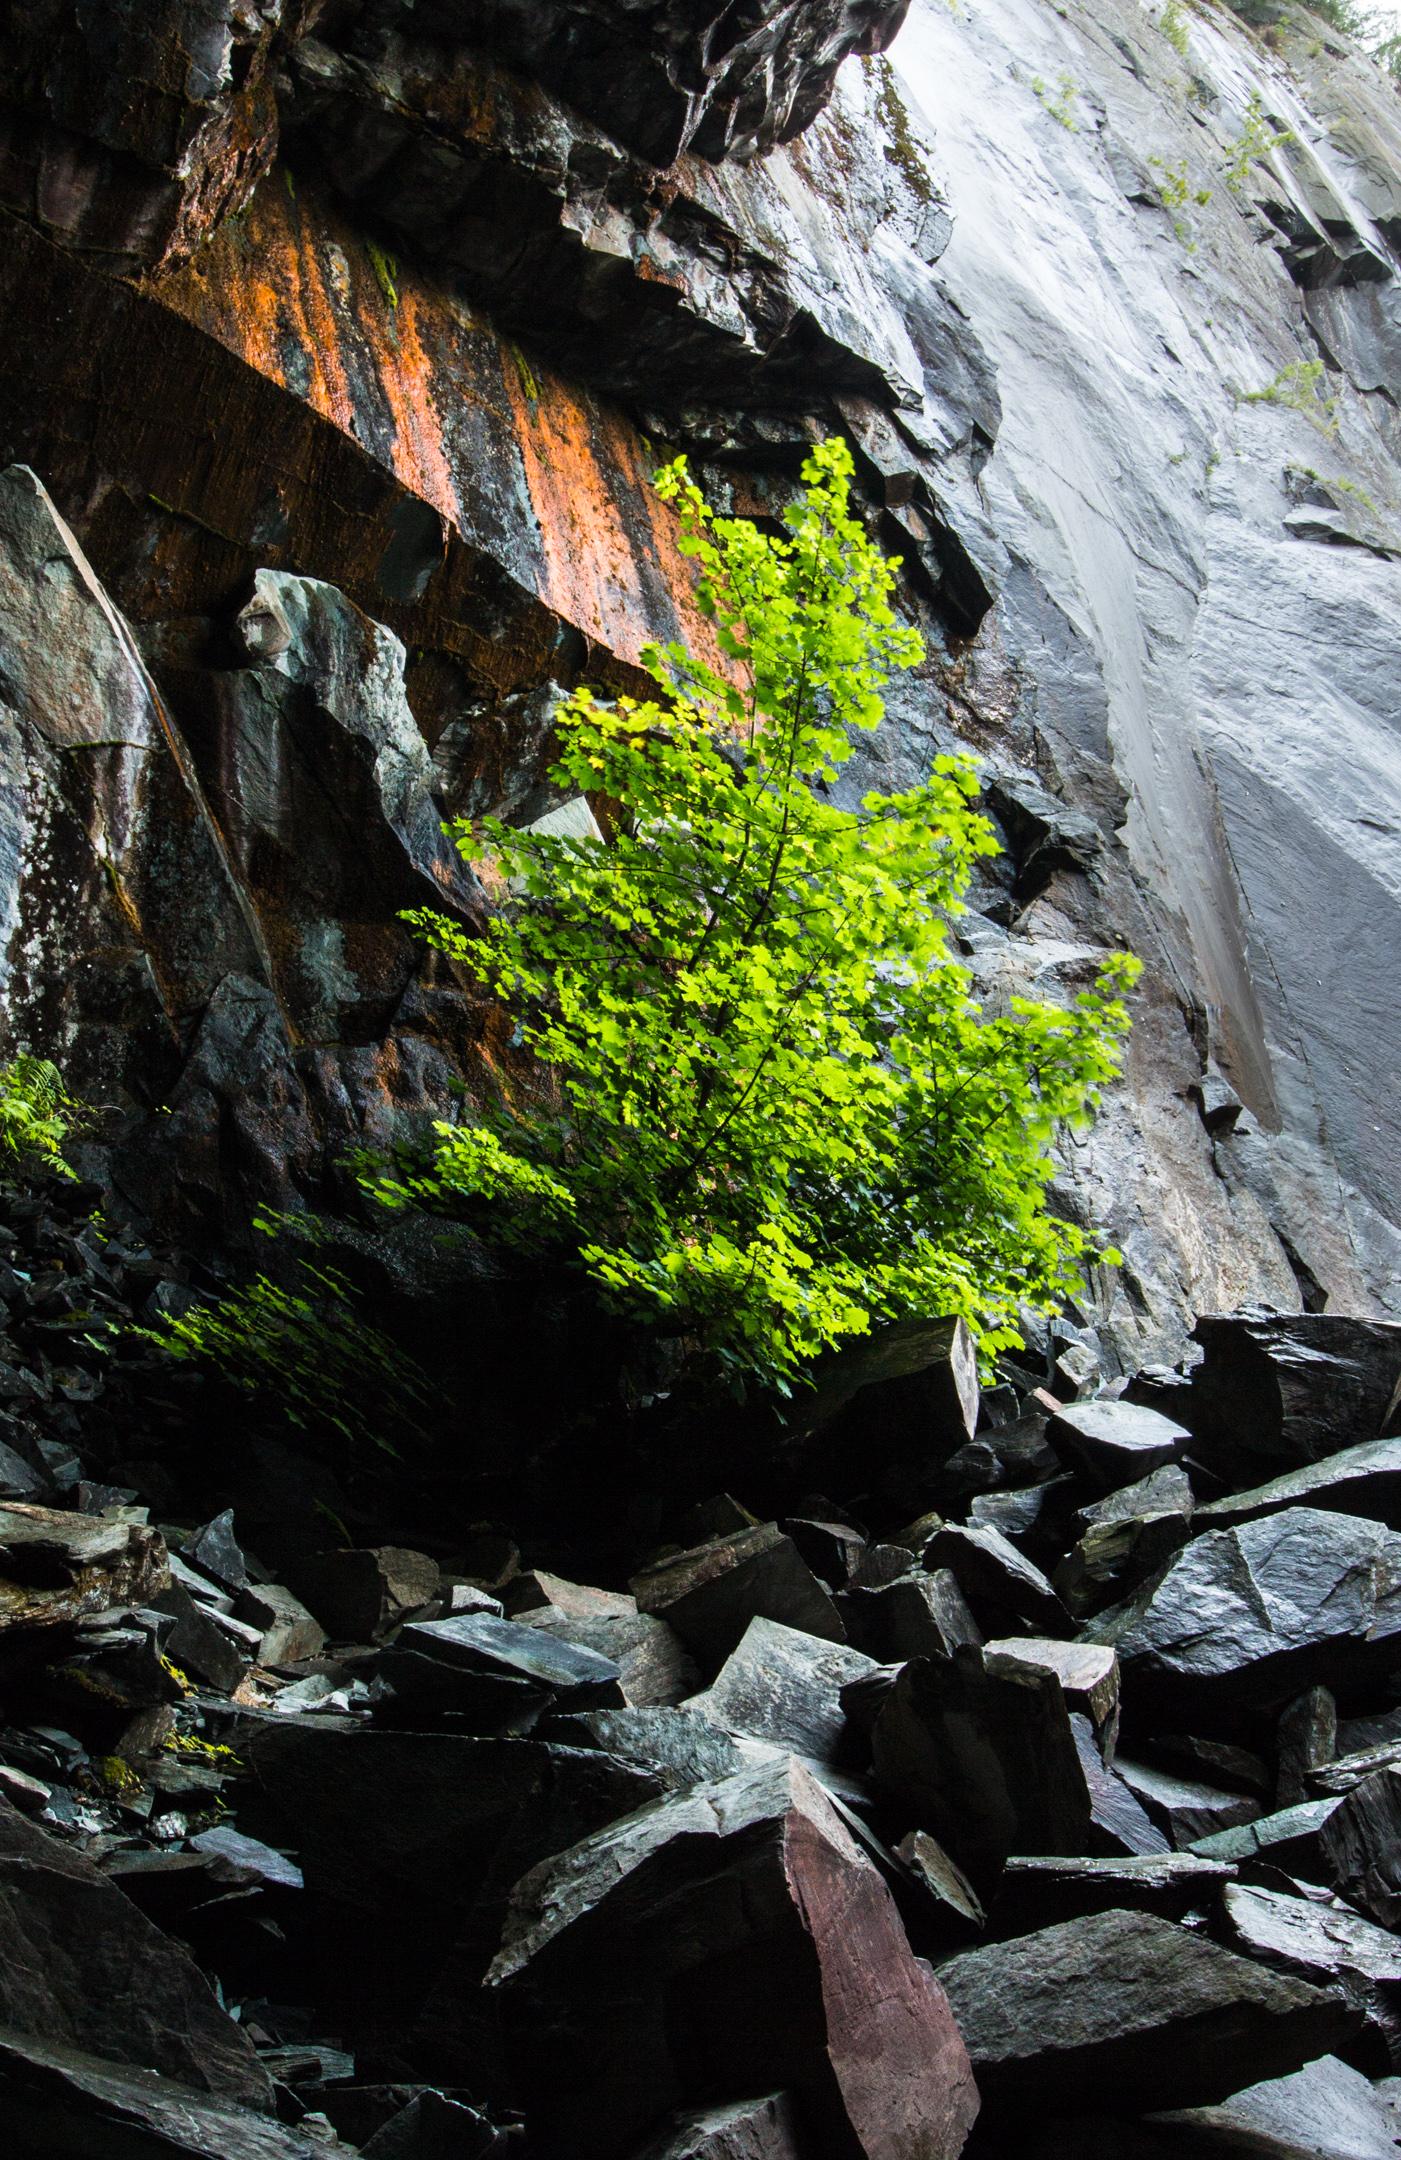 The Hodge Close Tree   18mm   f16   1/2 sec   iso 100   polarising filter